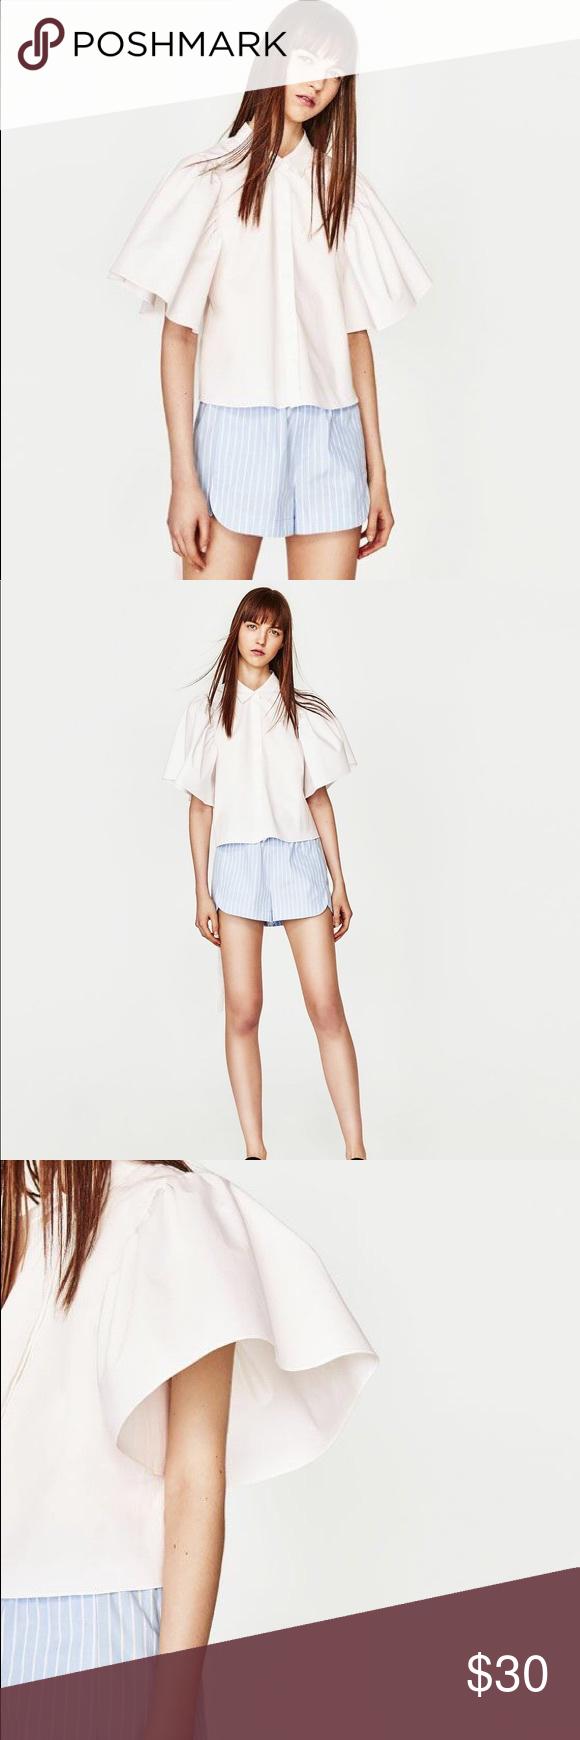 de7e59fc302ef NWT Zara White Puff Sleeve Tie back Top Hip-length shirt with lapel collar  and short